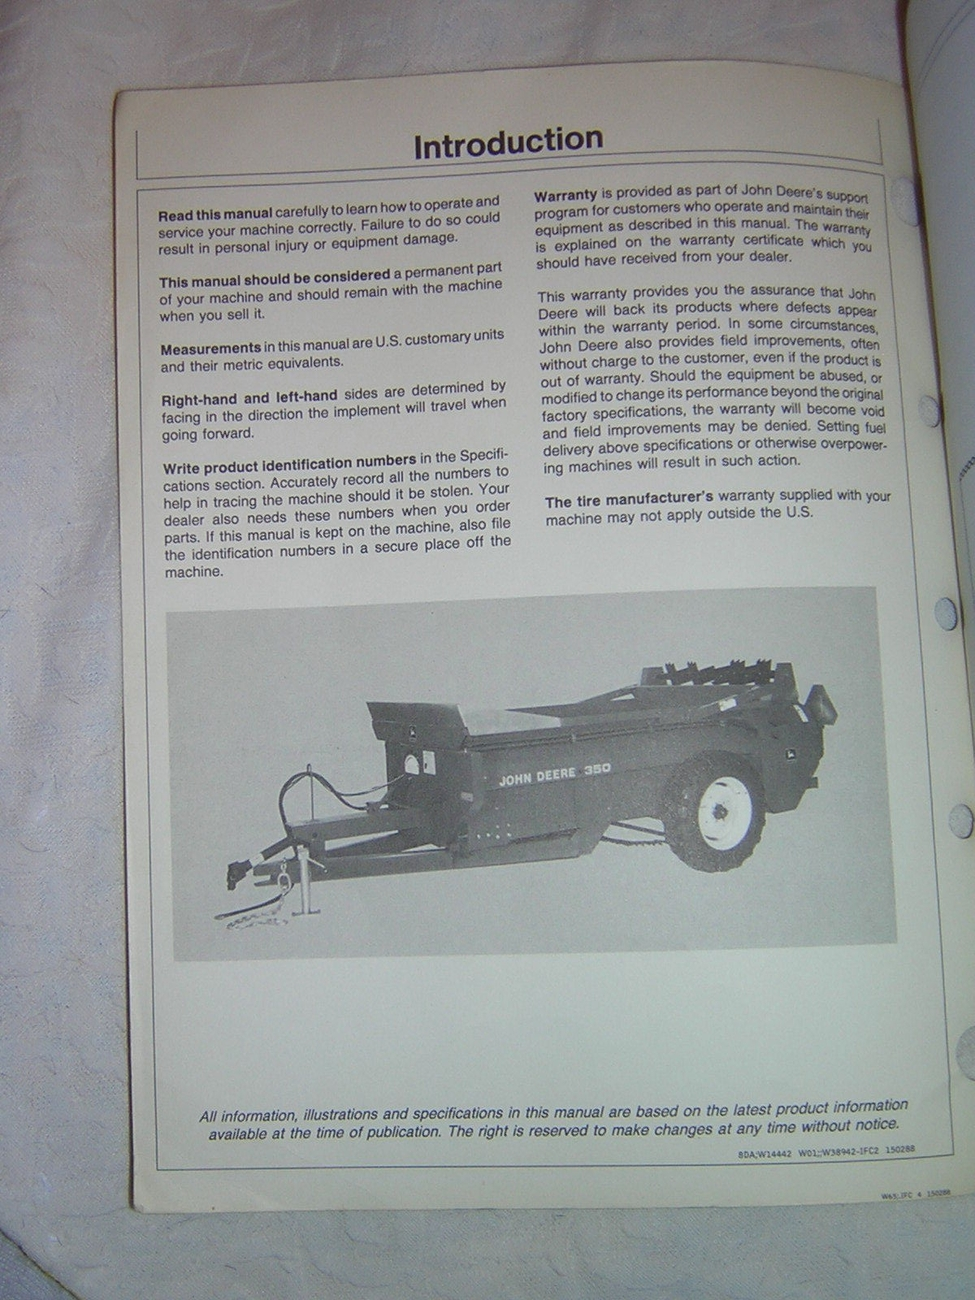 John Deere 350 Manure Spreader Operator's Manual